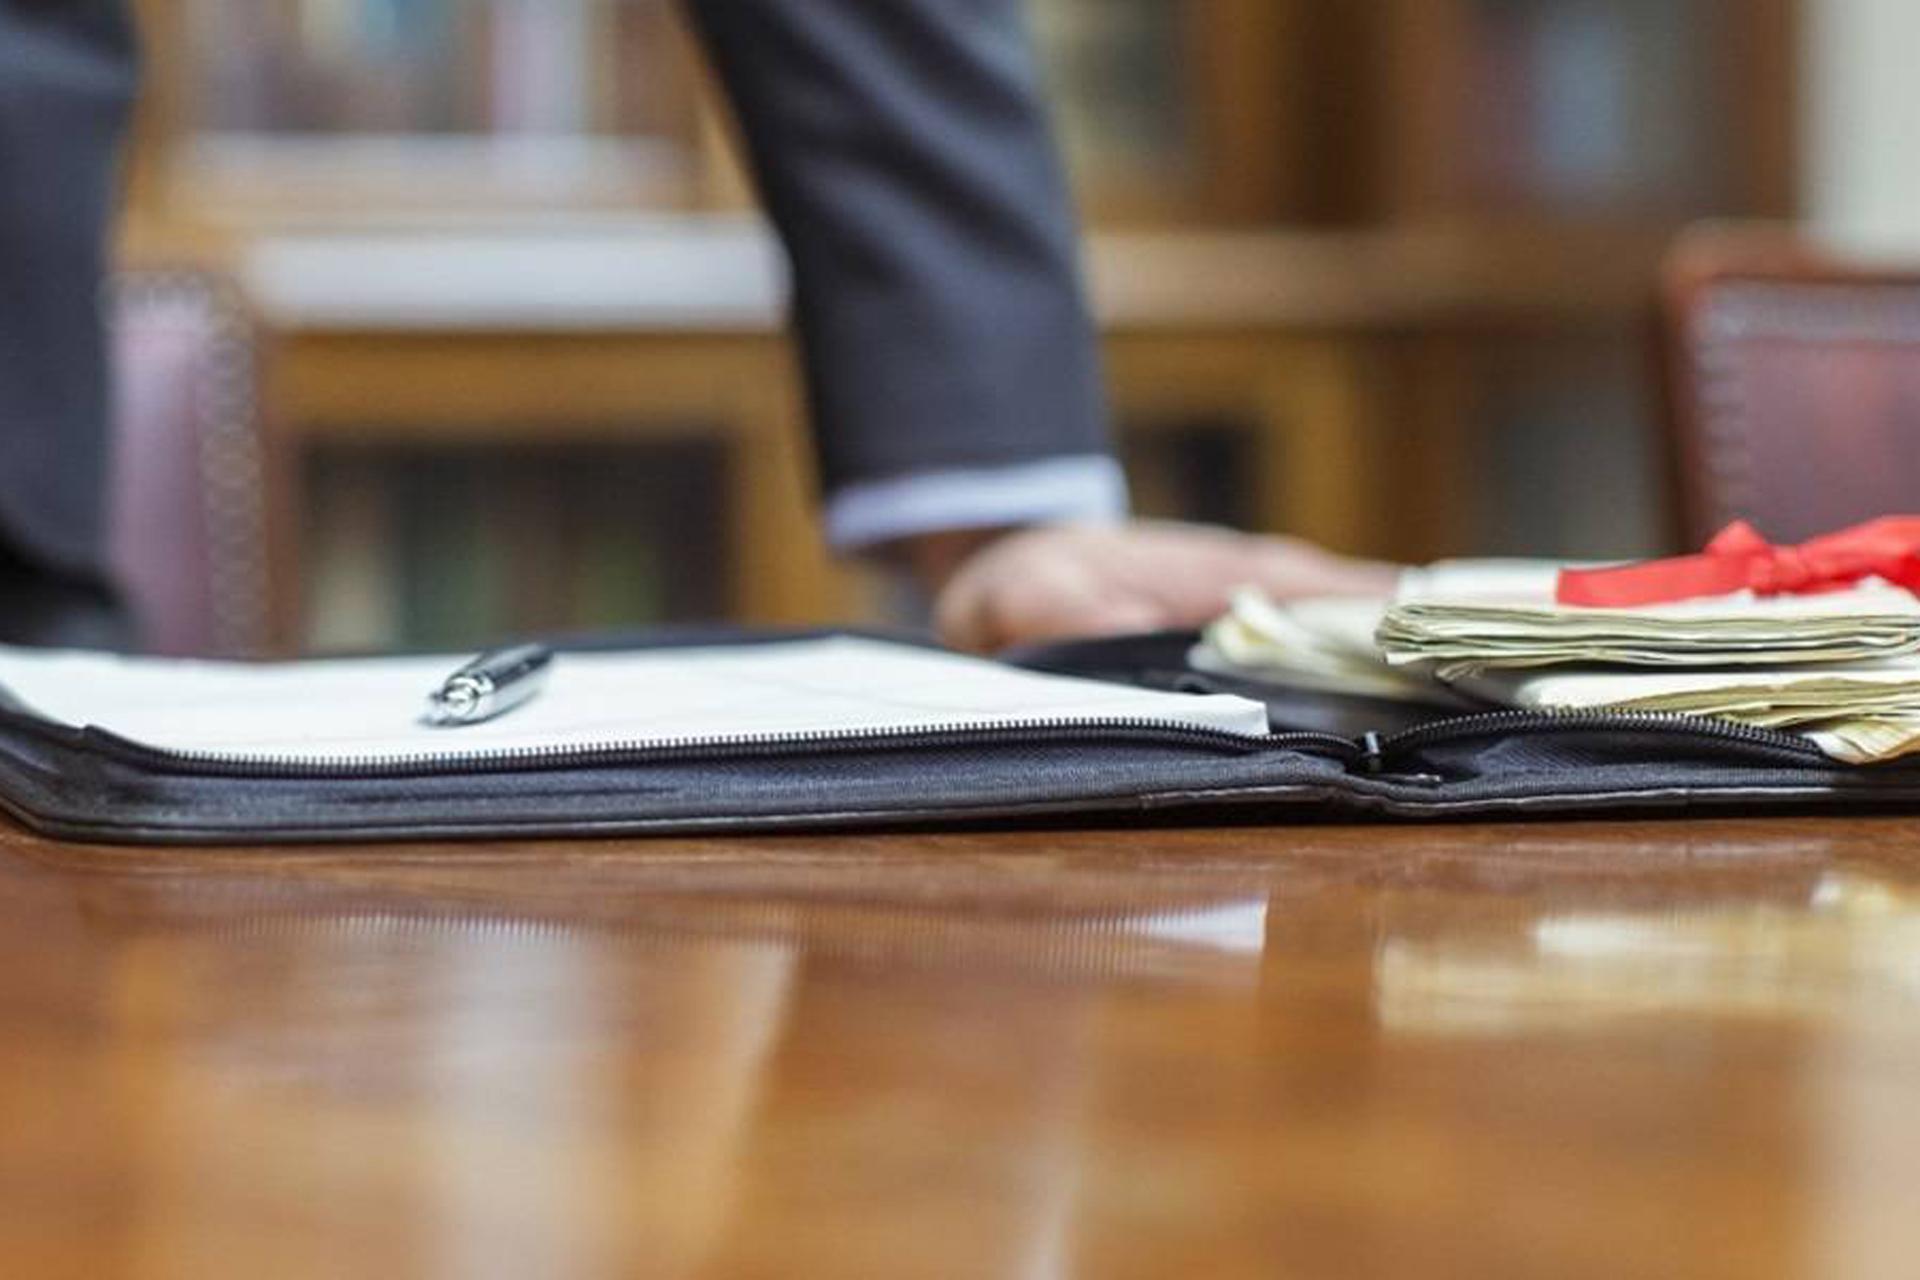 консультация уголовного юриста